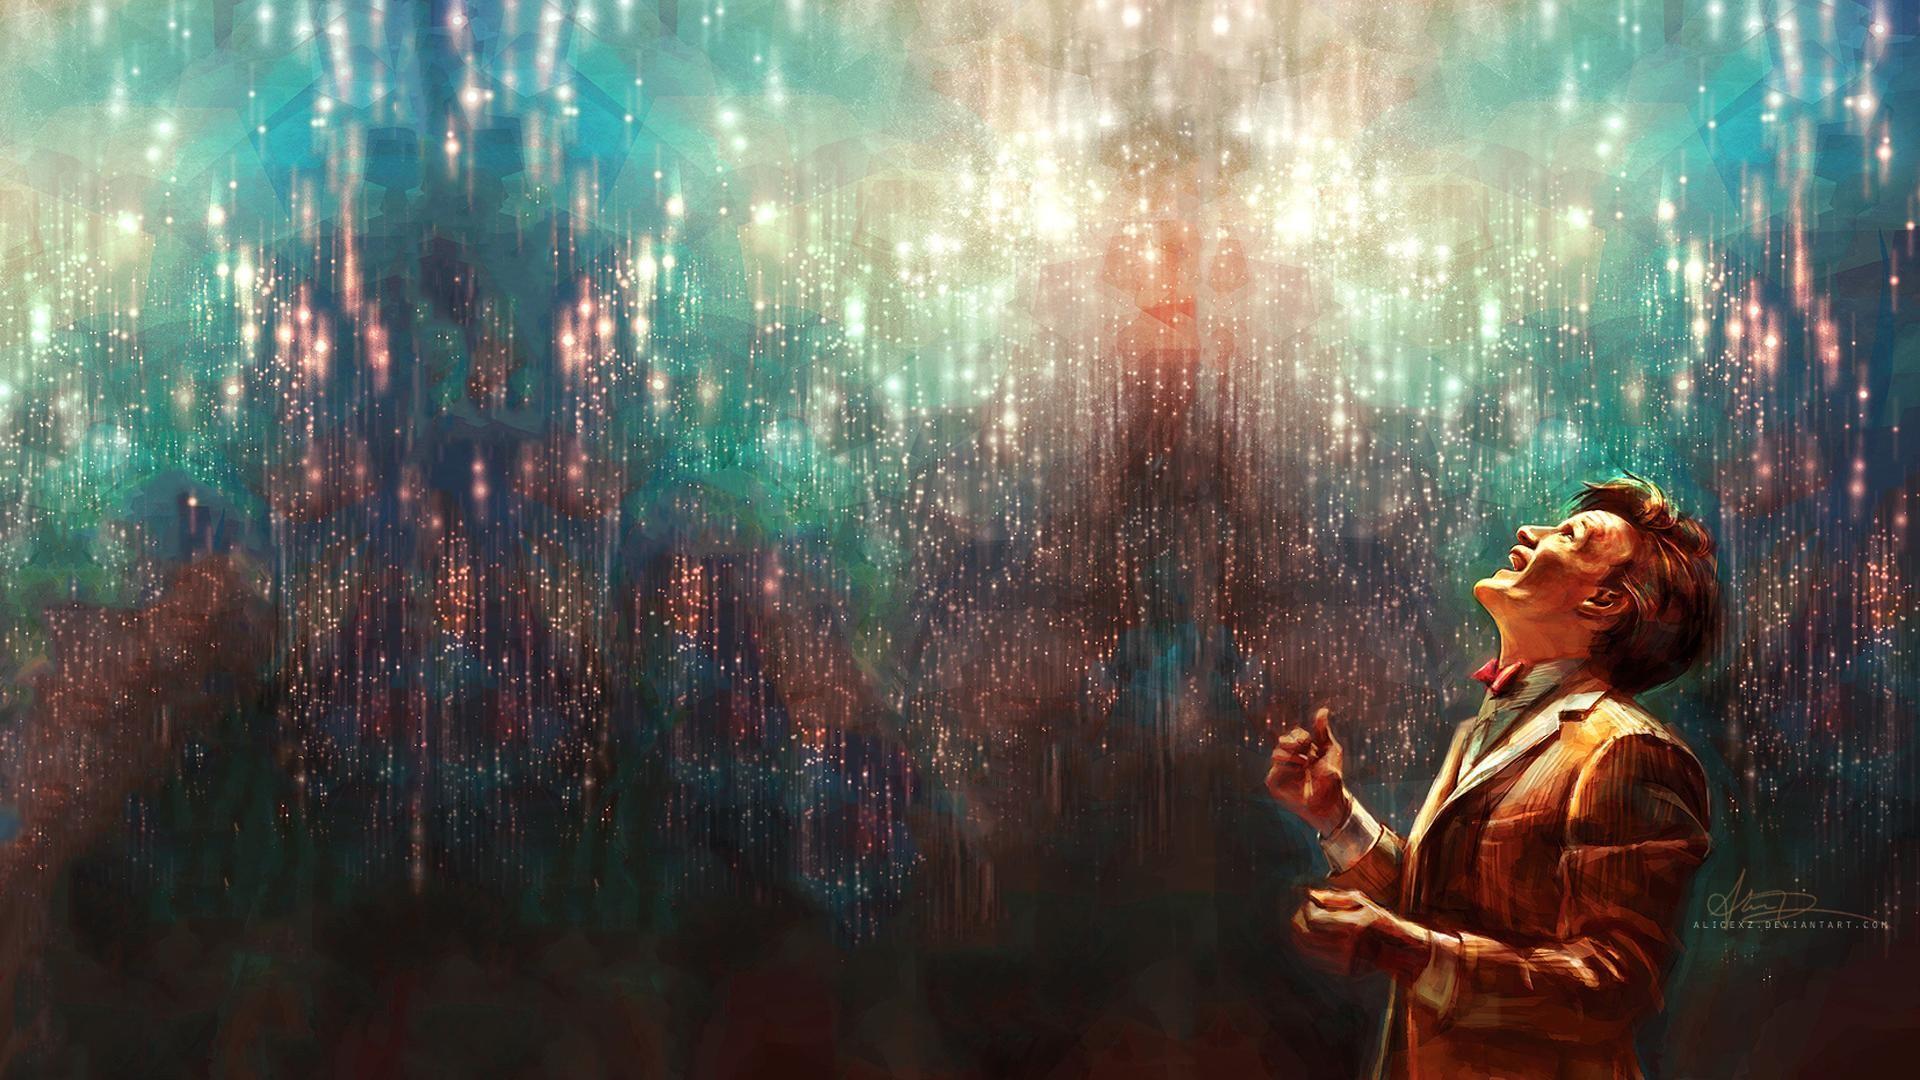 Stars Matt Smith glowing Eleventh Doctor smiling artwork ...